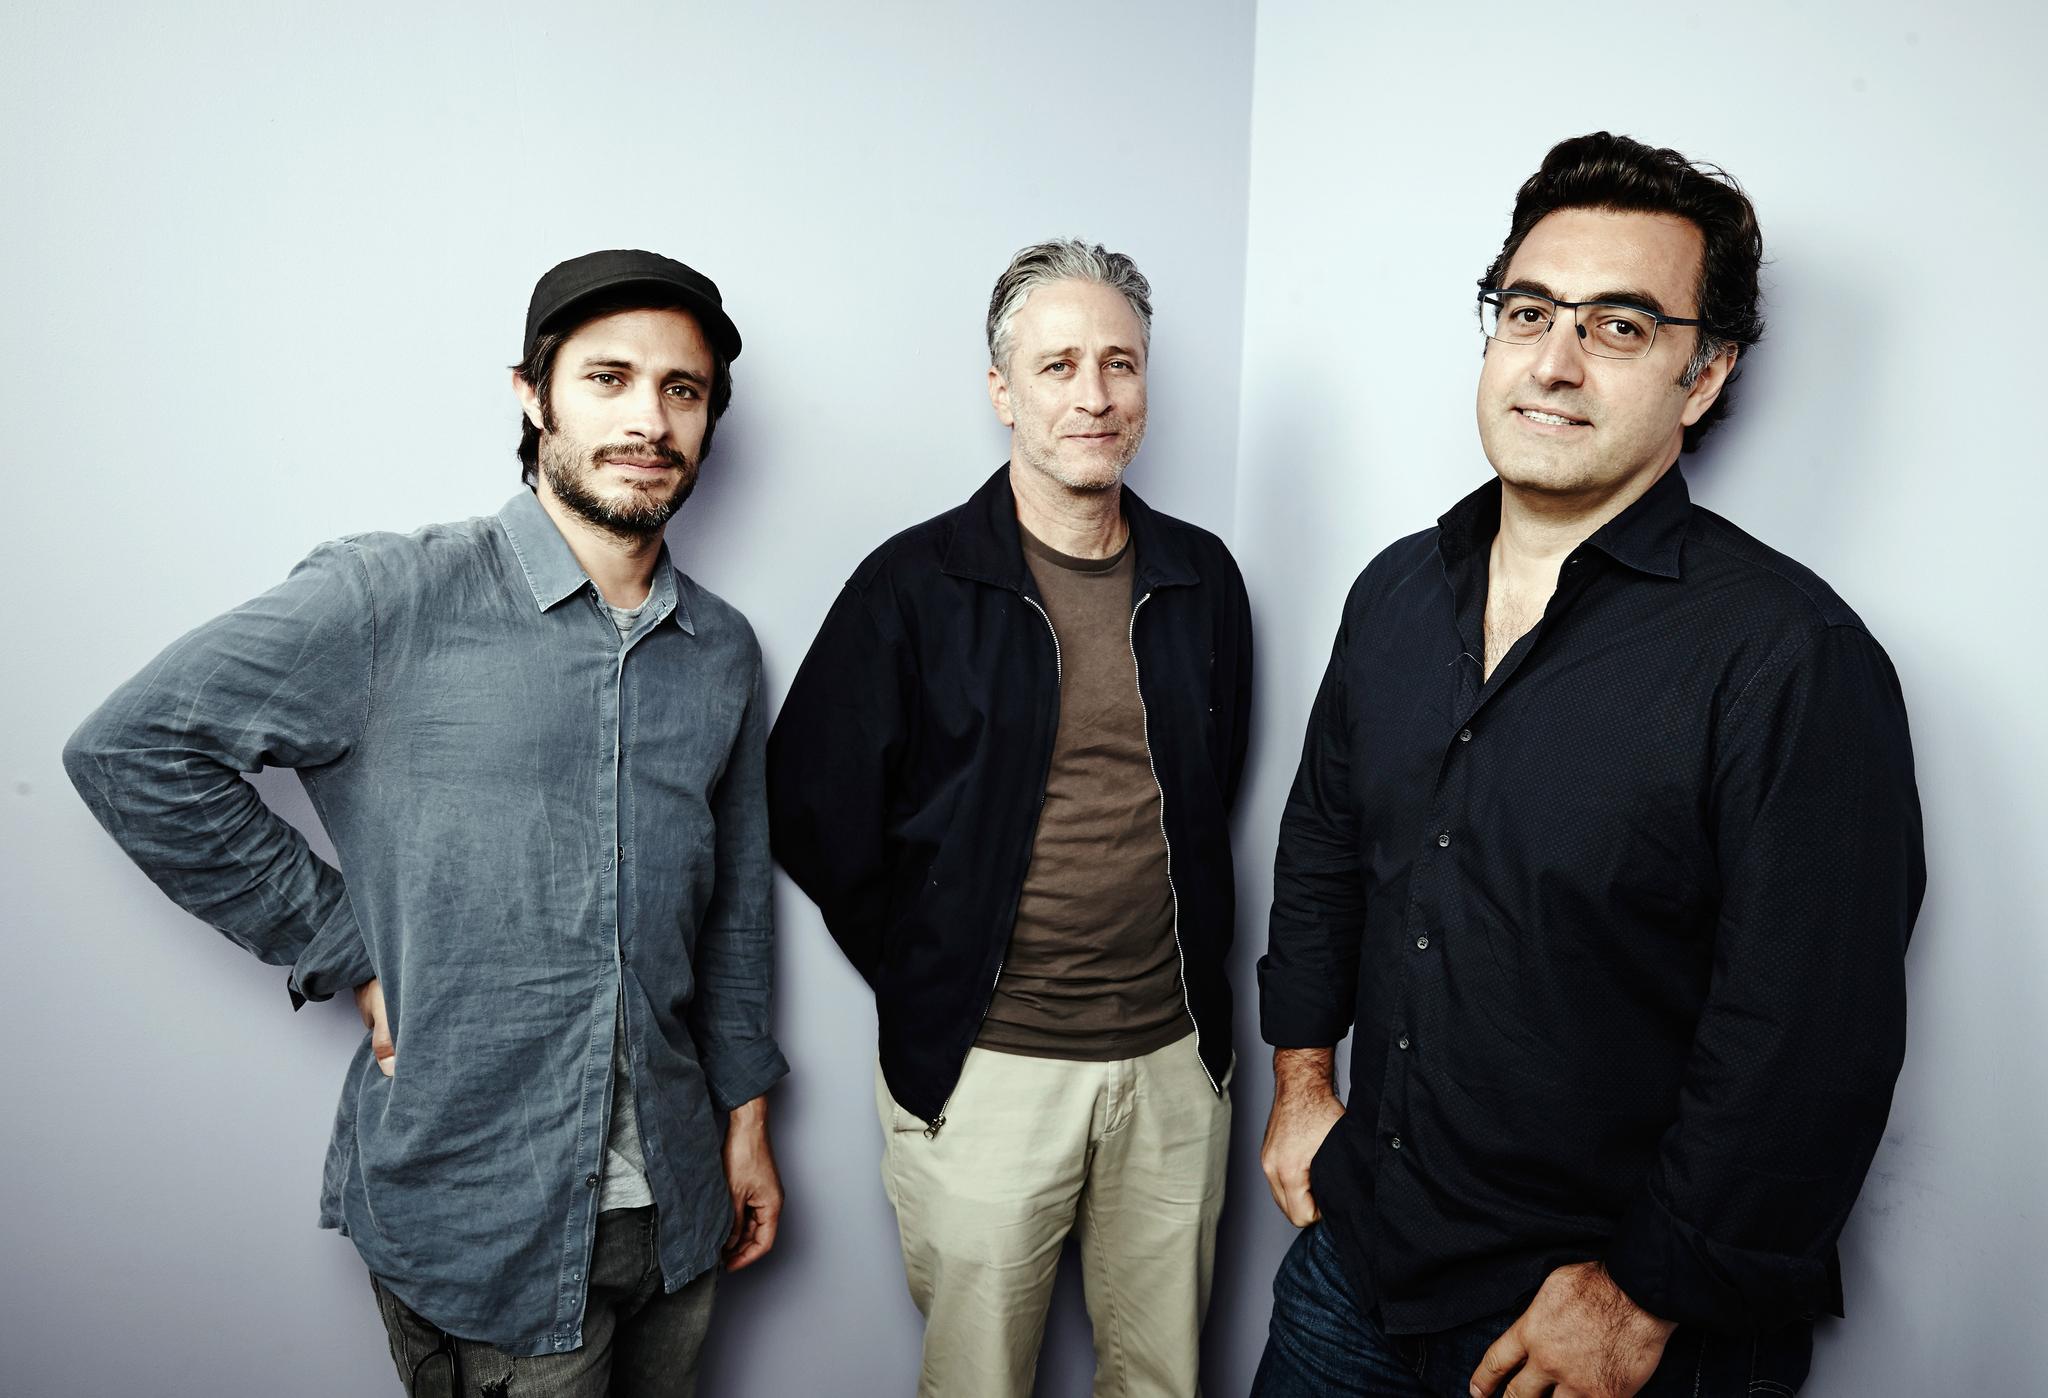 Jon Stewart Explains Why He Chose Gael Garcia Bernal To Play an Iranian Journalist in 'Rosewater'